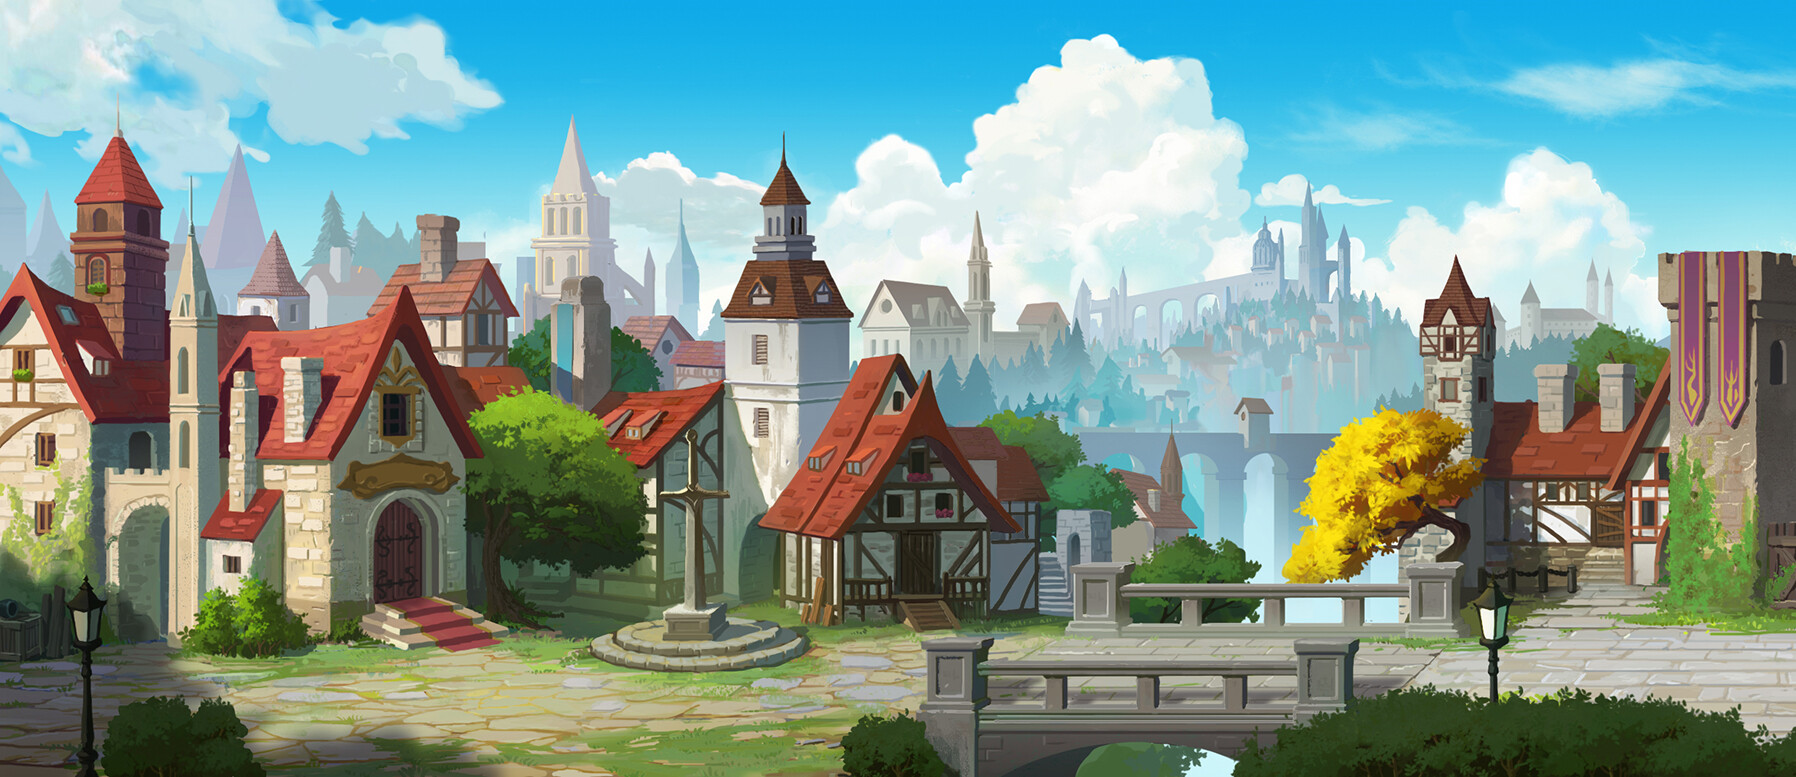 Evil chen town template2 zzz